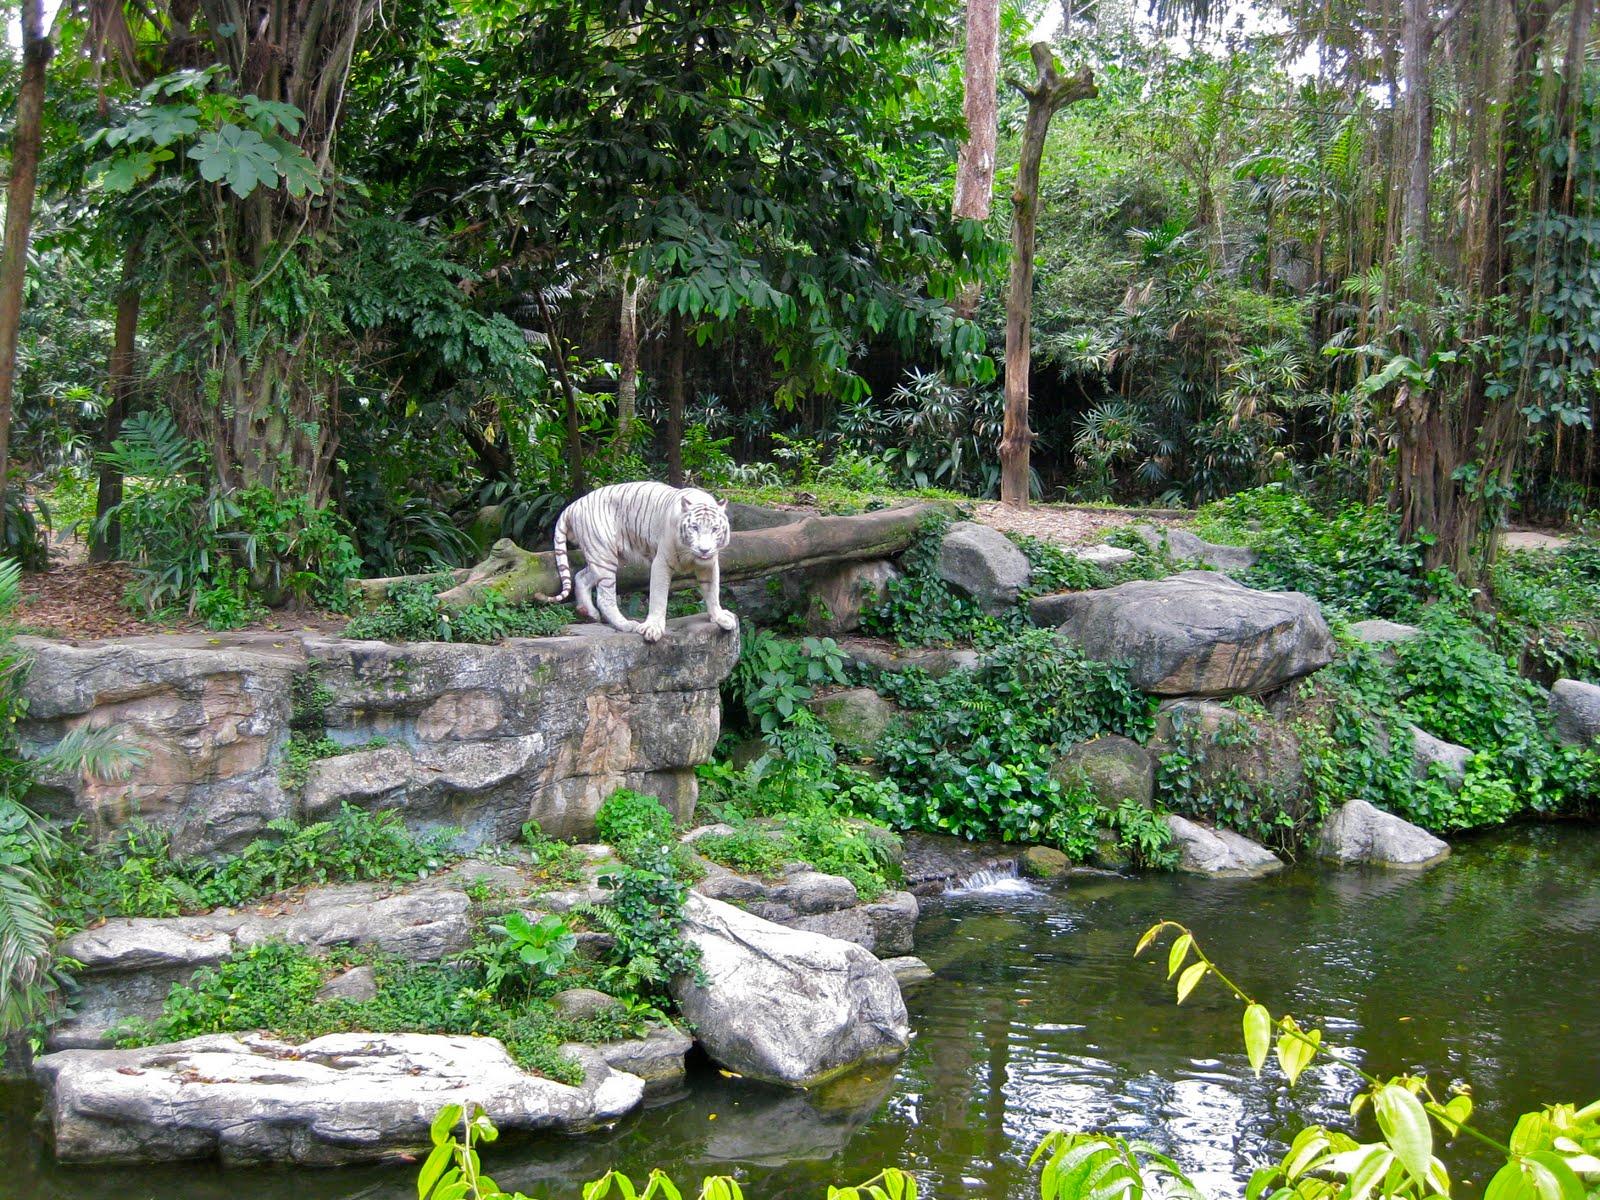 Tggerrss zoo